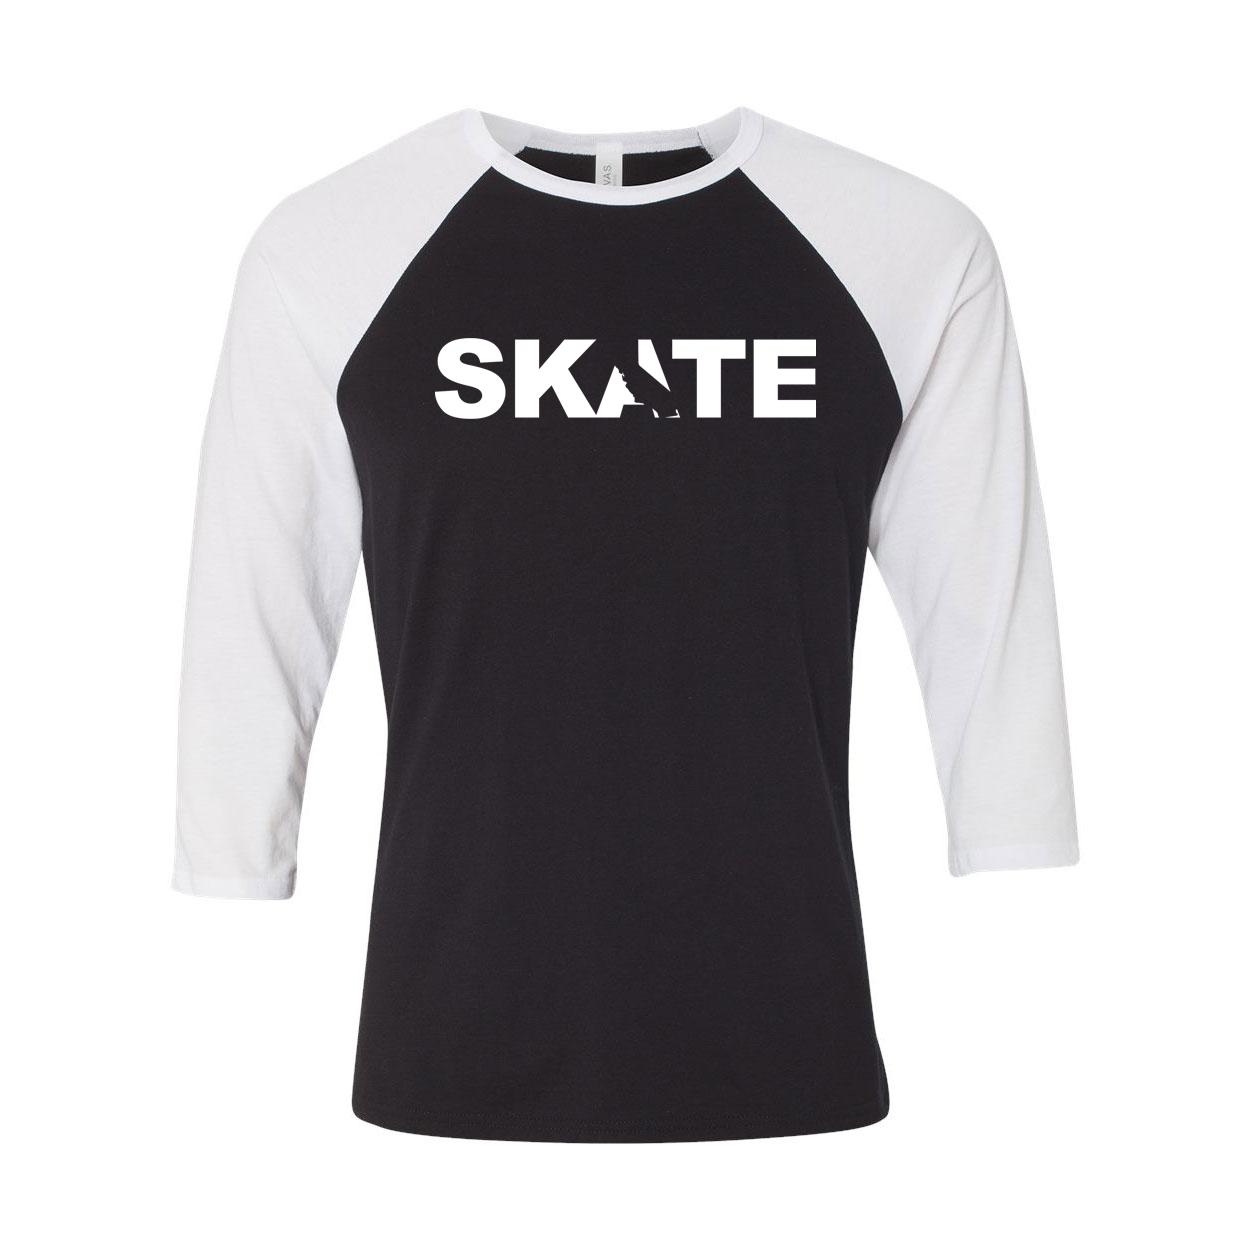 Skate California Classic Raglan Shirt Black/White (White Logo)